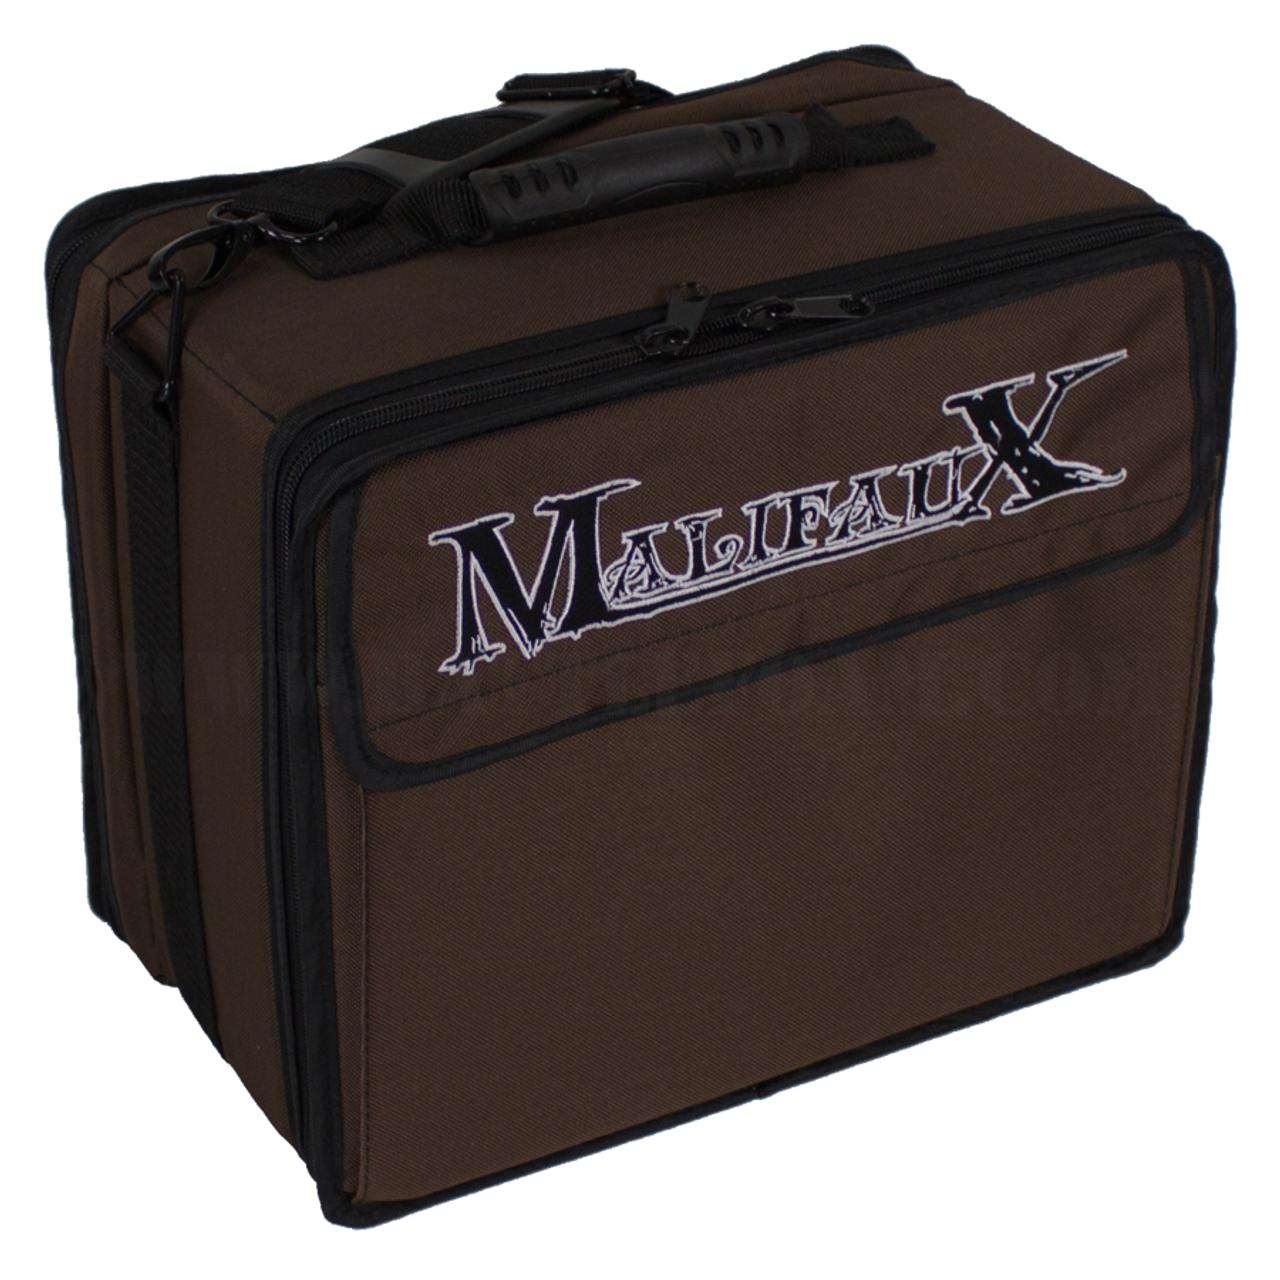 Malifaux Bag